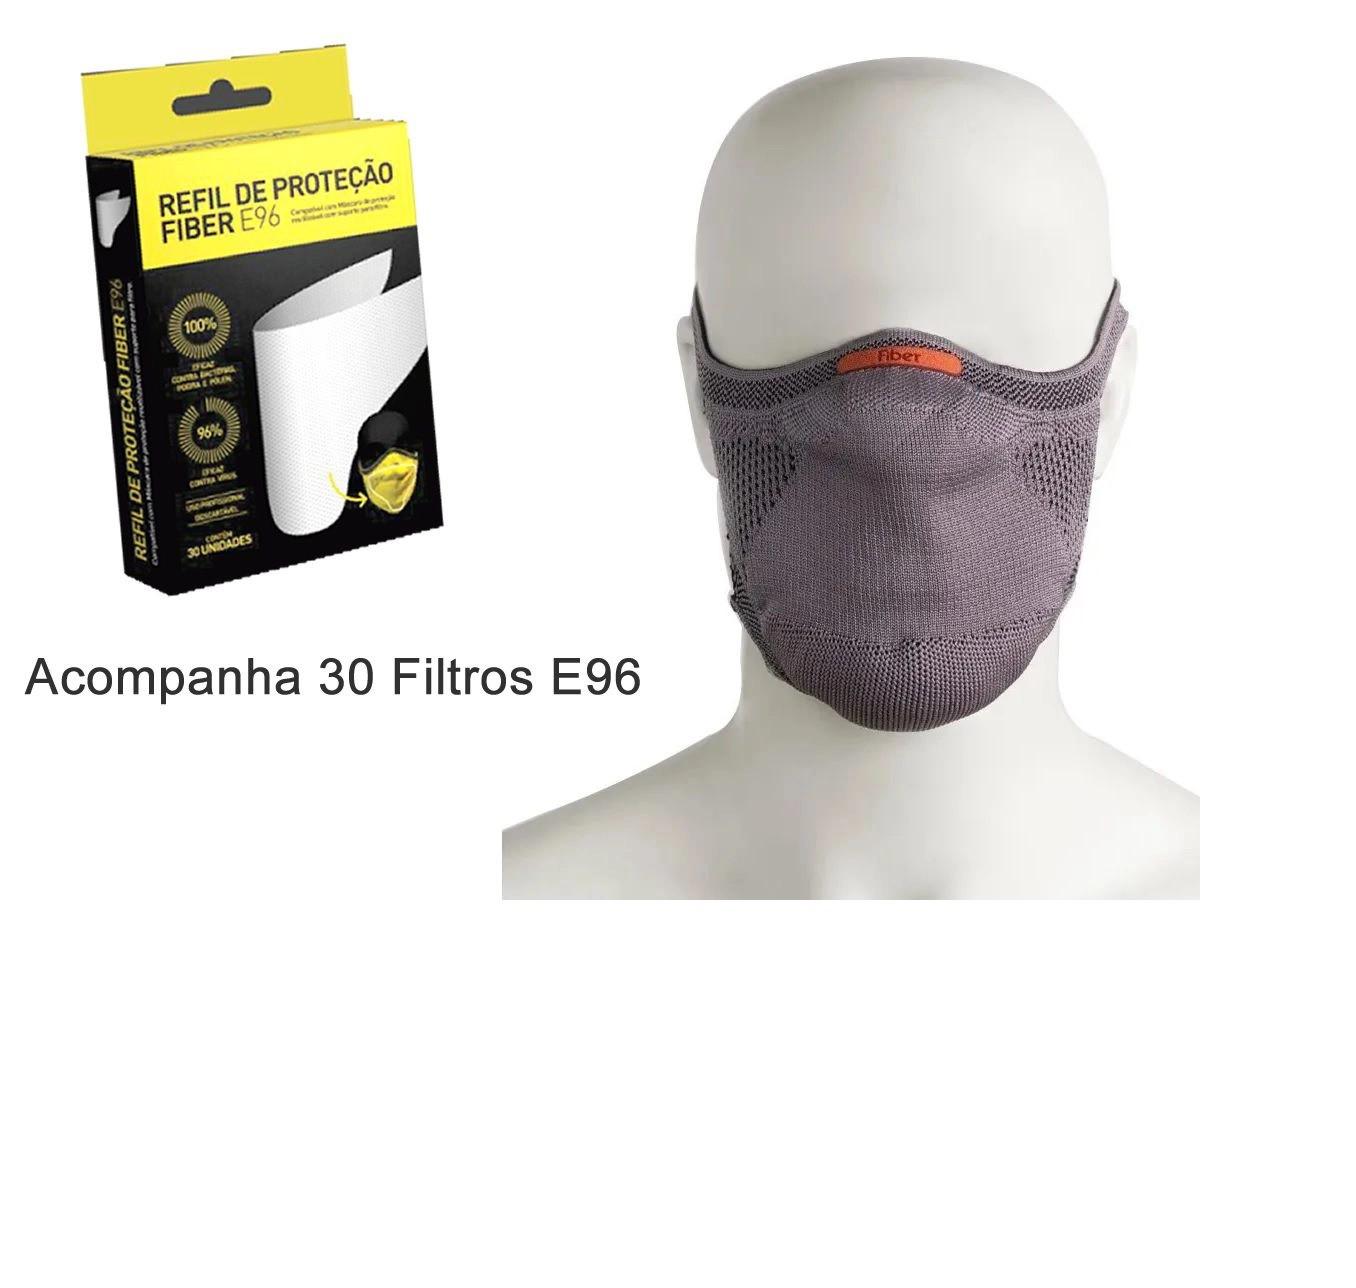 kit 30 Filtros E96 Mascara Proteção Fiber knit